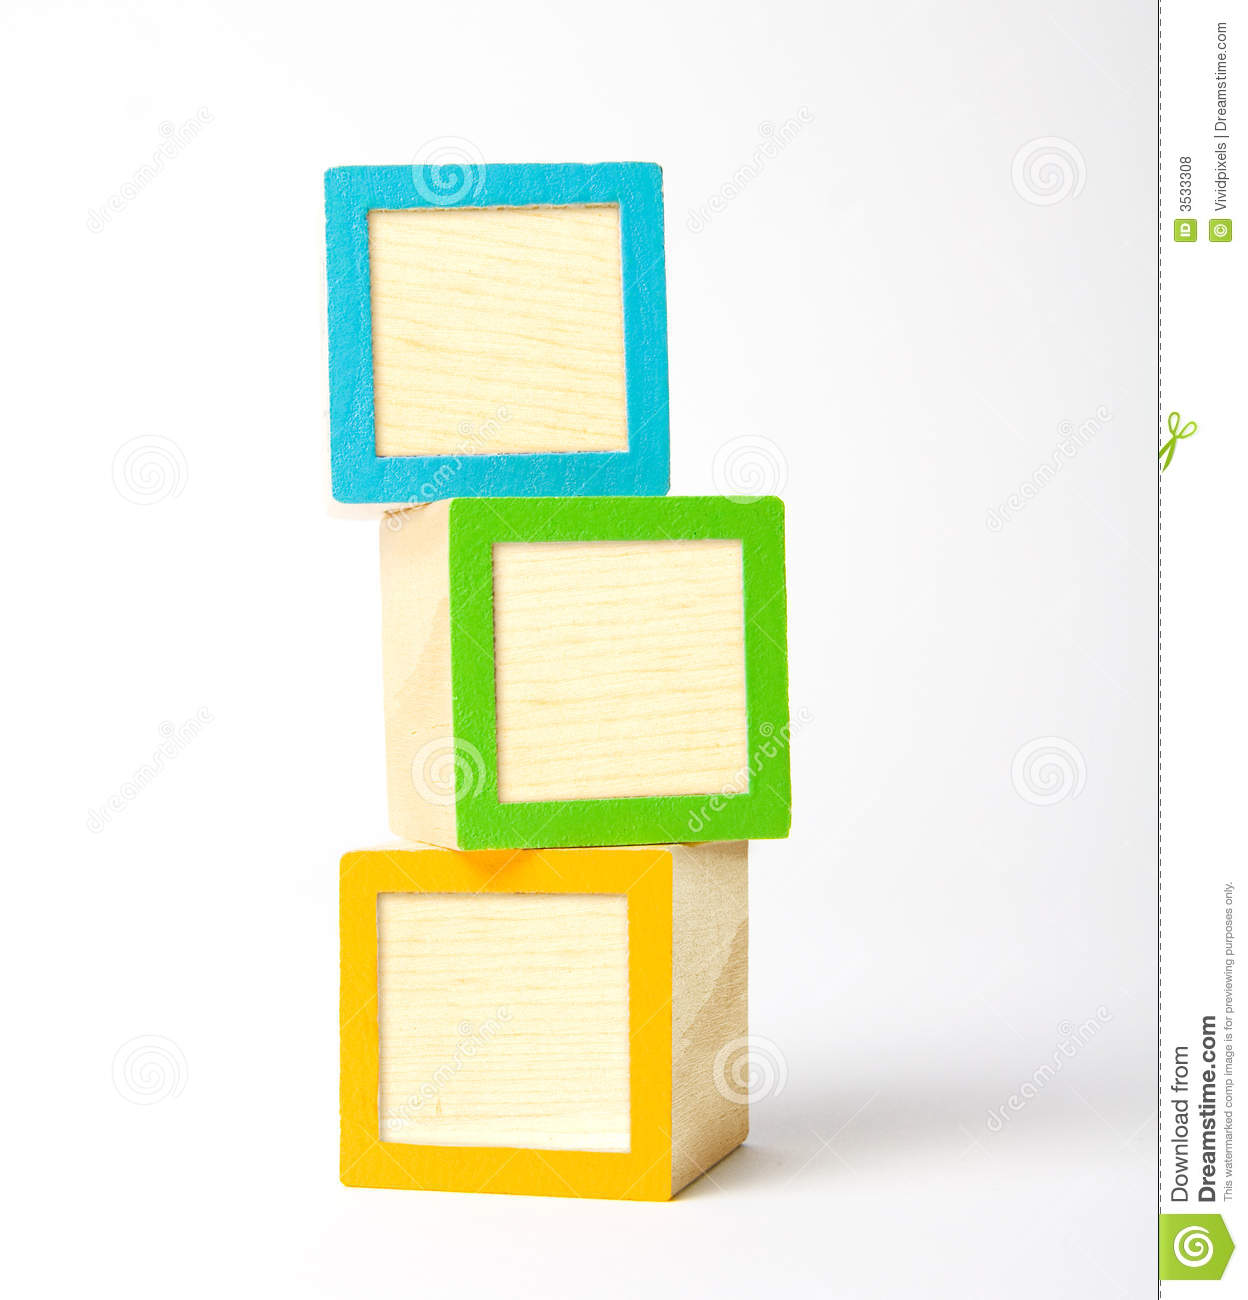 Building blocks clipart blank outline svg transparent library Blank Baby Blocks Clipart - Clipart Kid svg transparent library